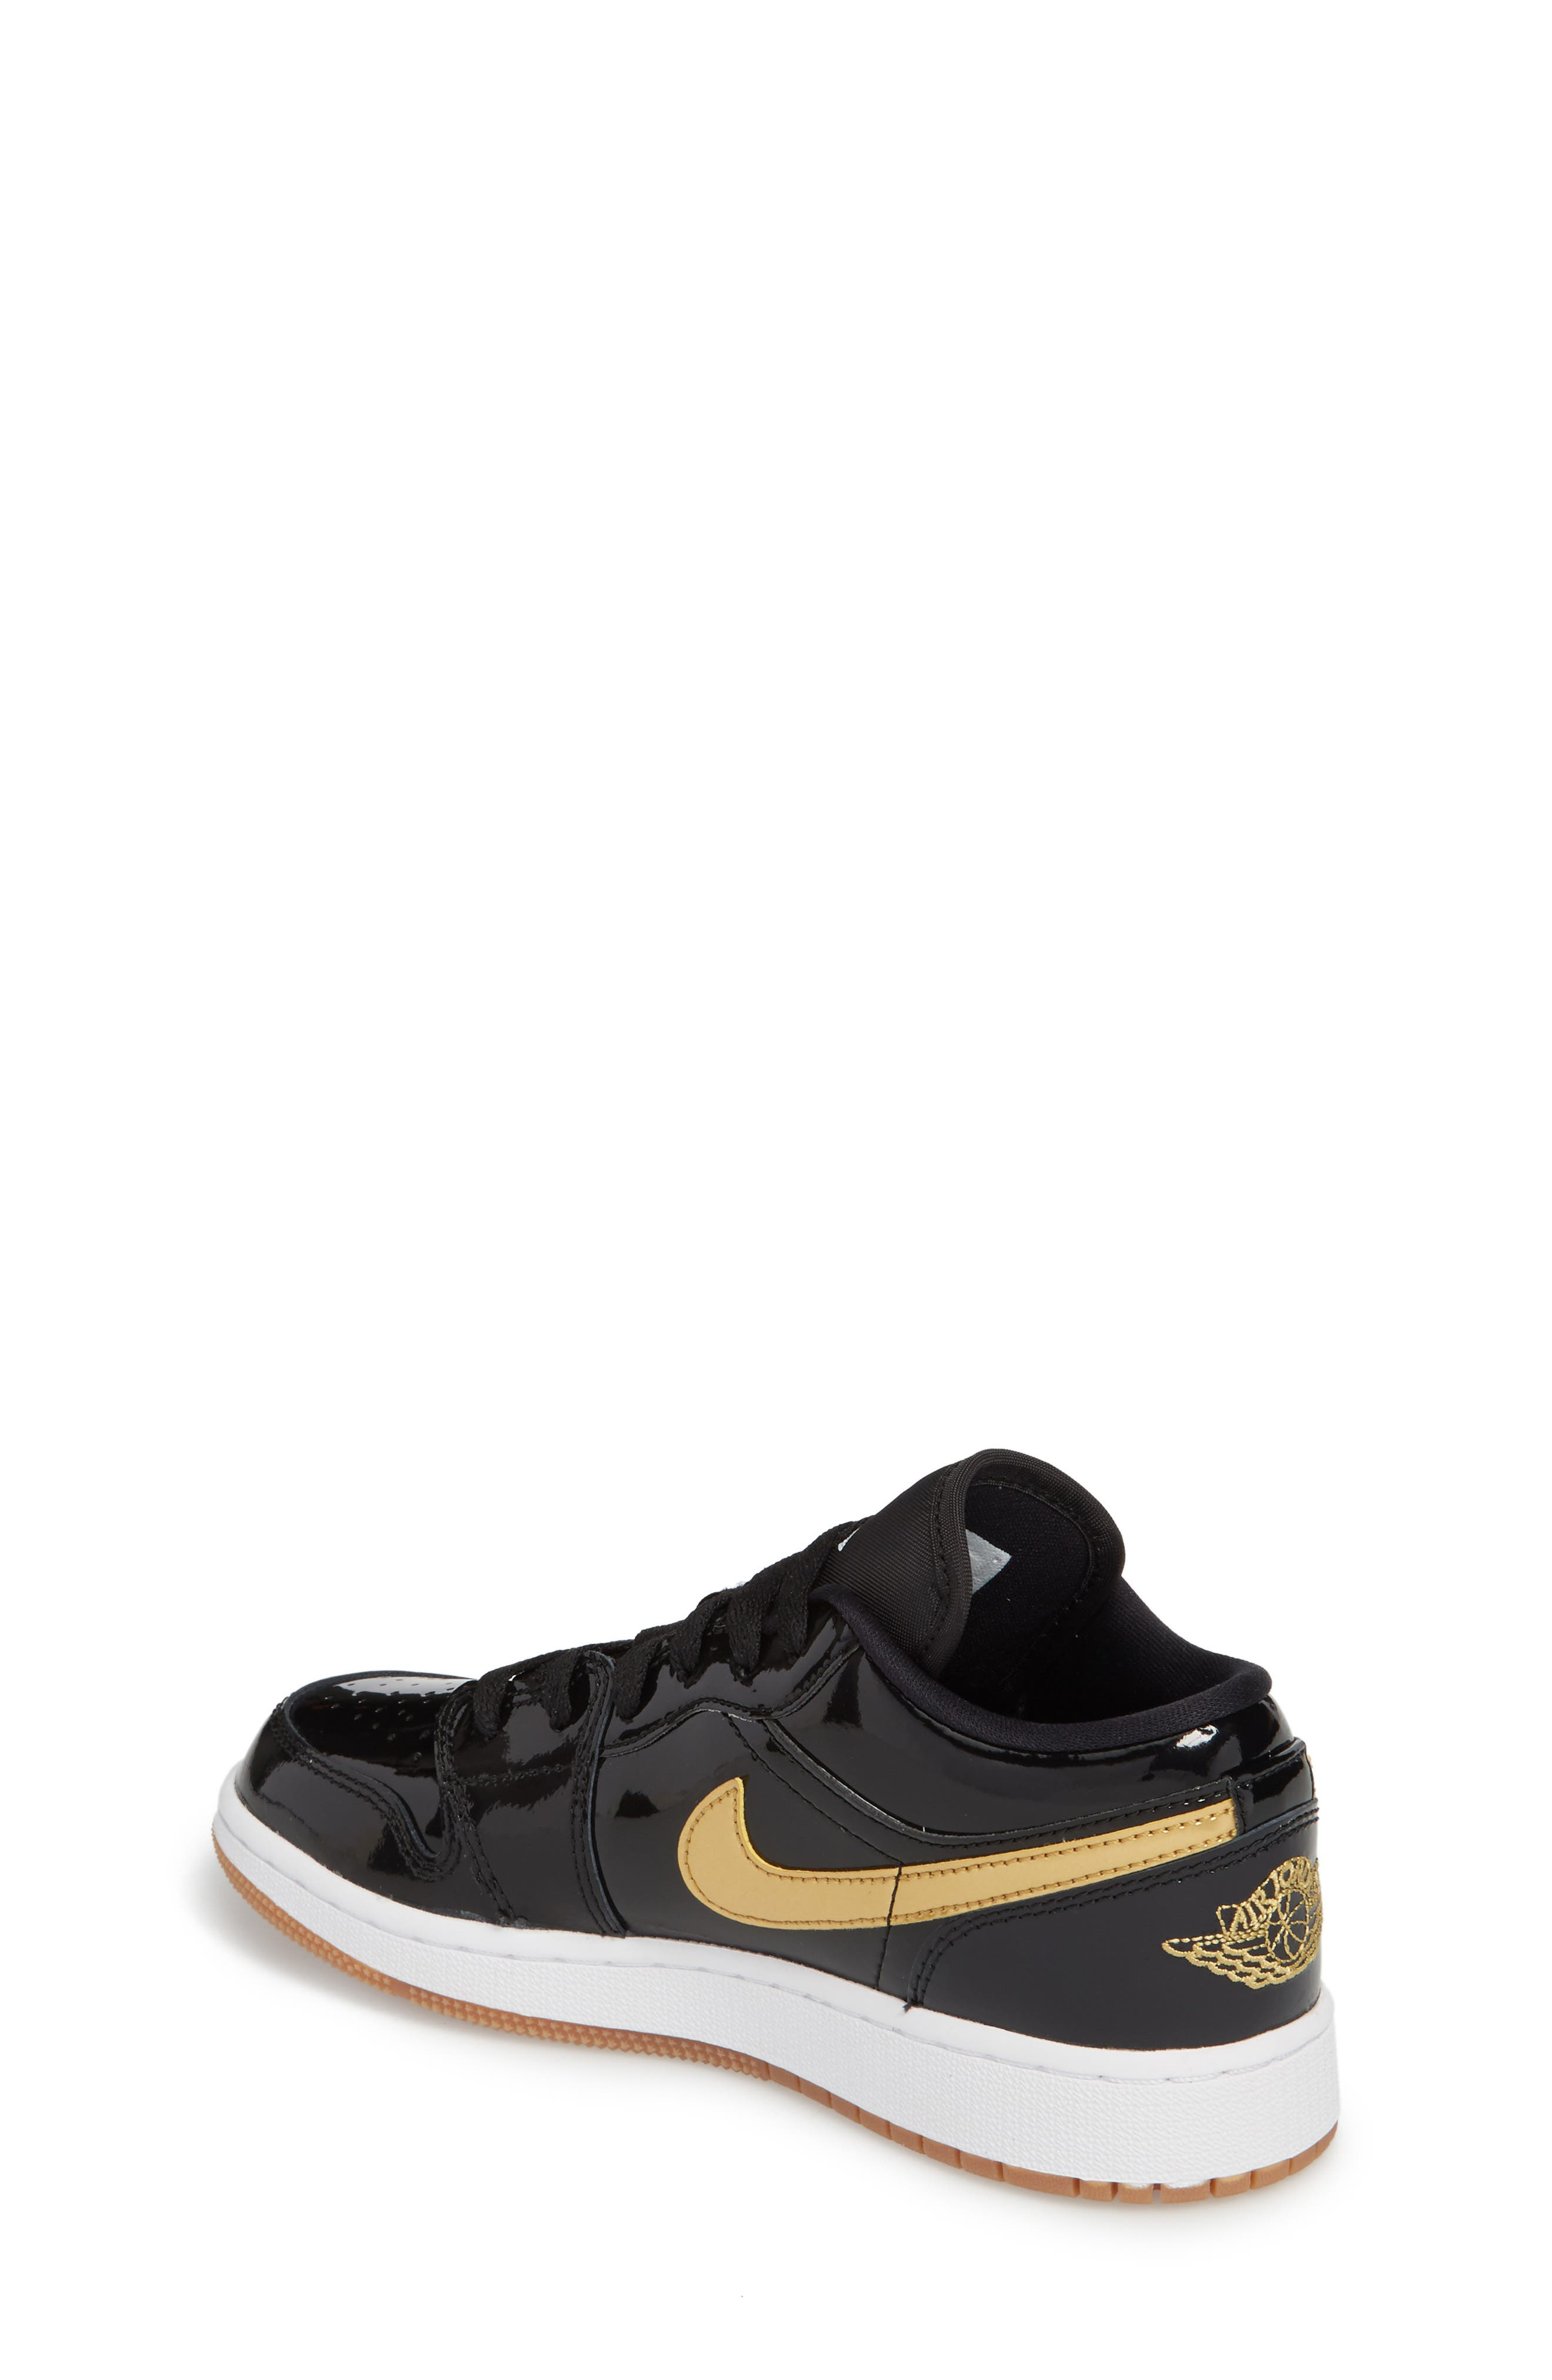 Nike 'Jordan 1 Low' Basketball Shoe,                             Alternate thumbnail 2, color,                             Black/ Metallic Gold/ White